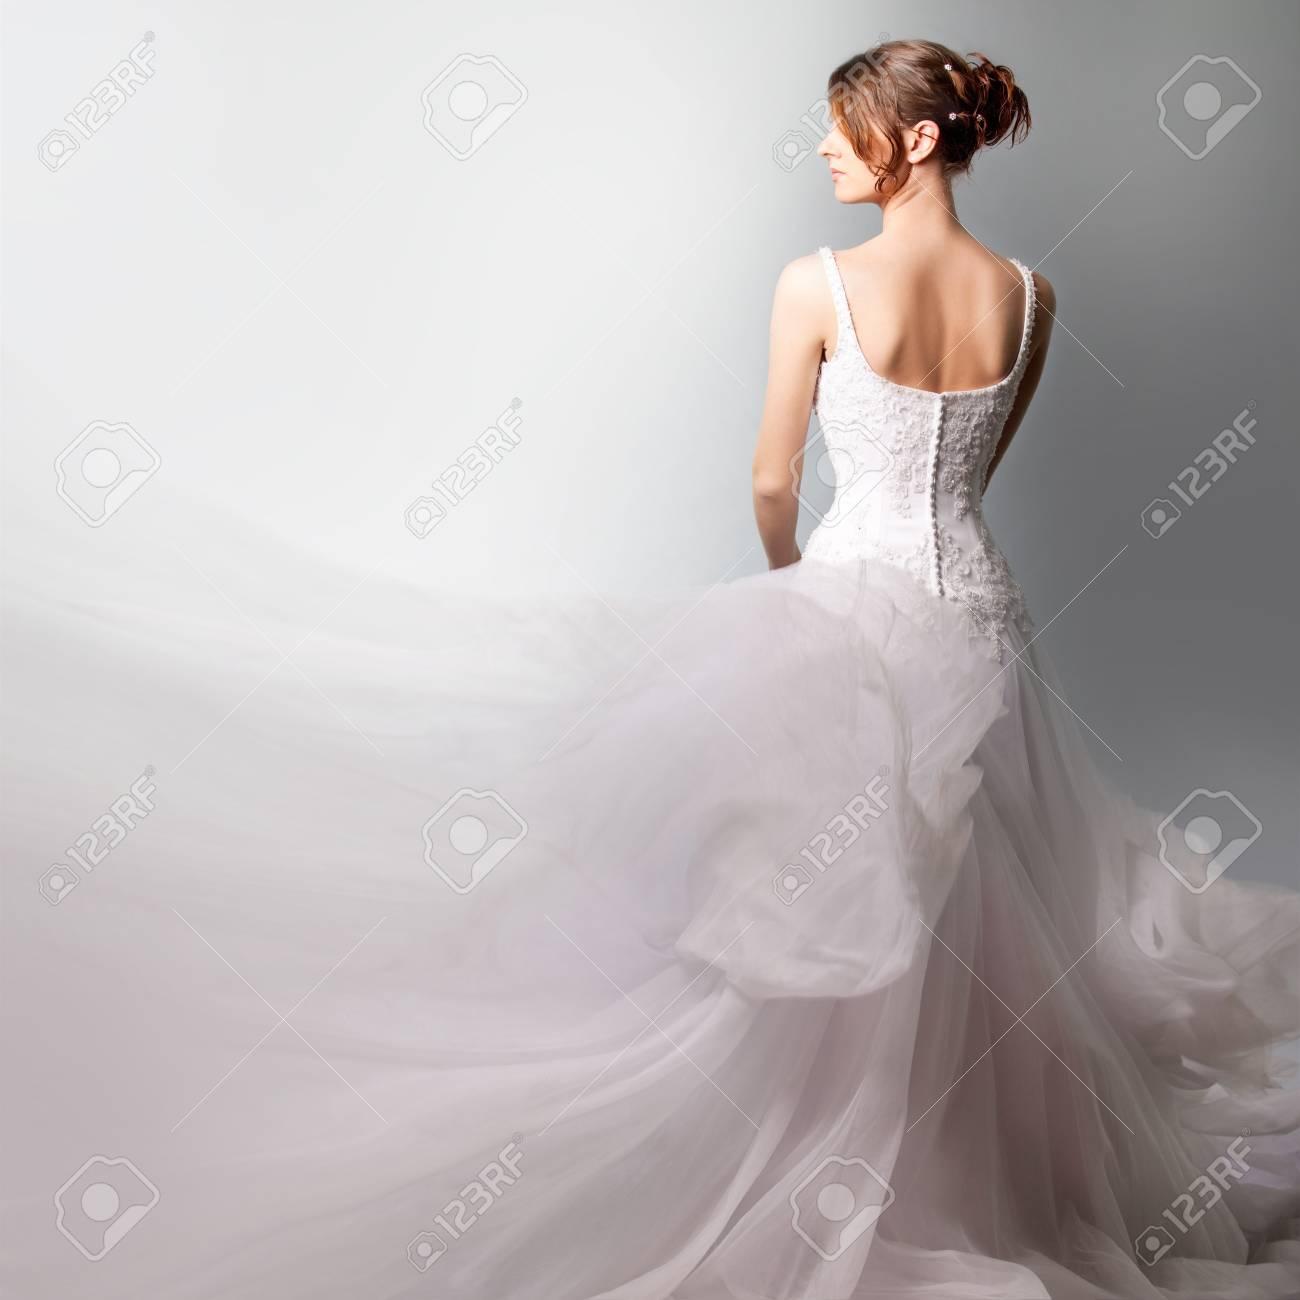 beautiful  bride in a luxurious wedding dress Stock Photo - 9709115